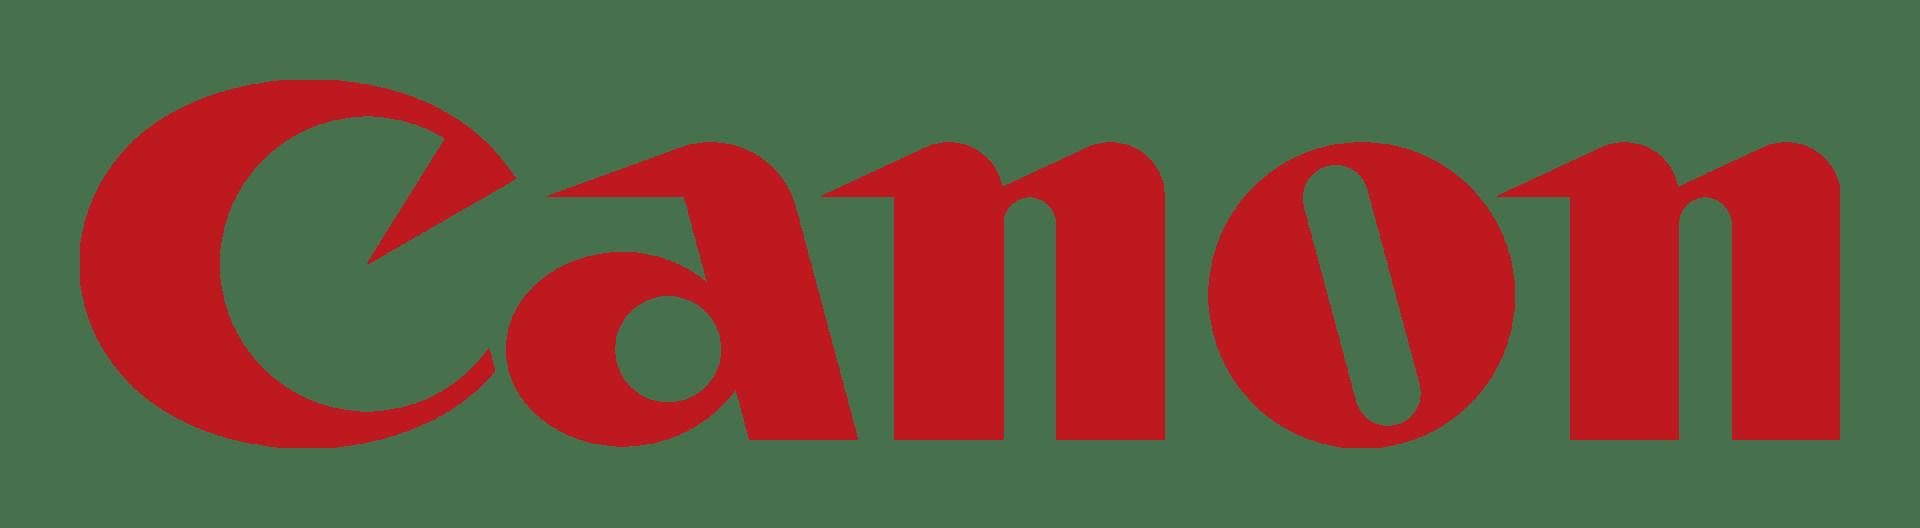 canon-inc.-logo-png-transparent-w1920.png